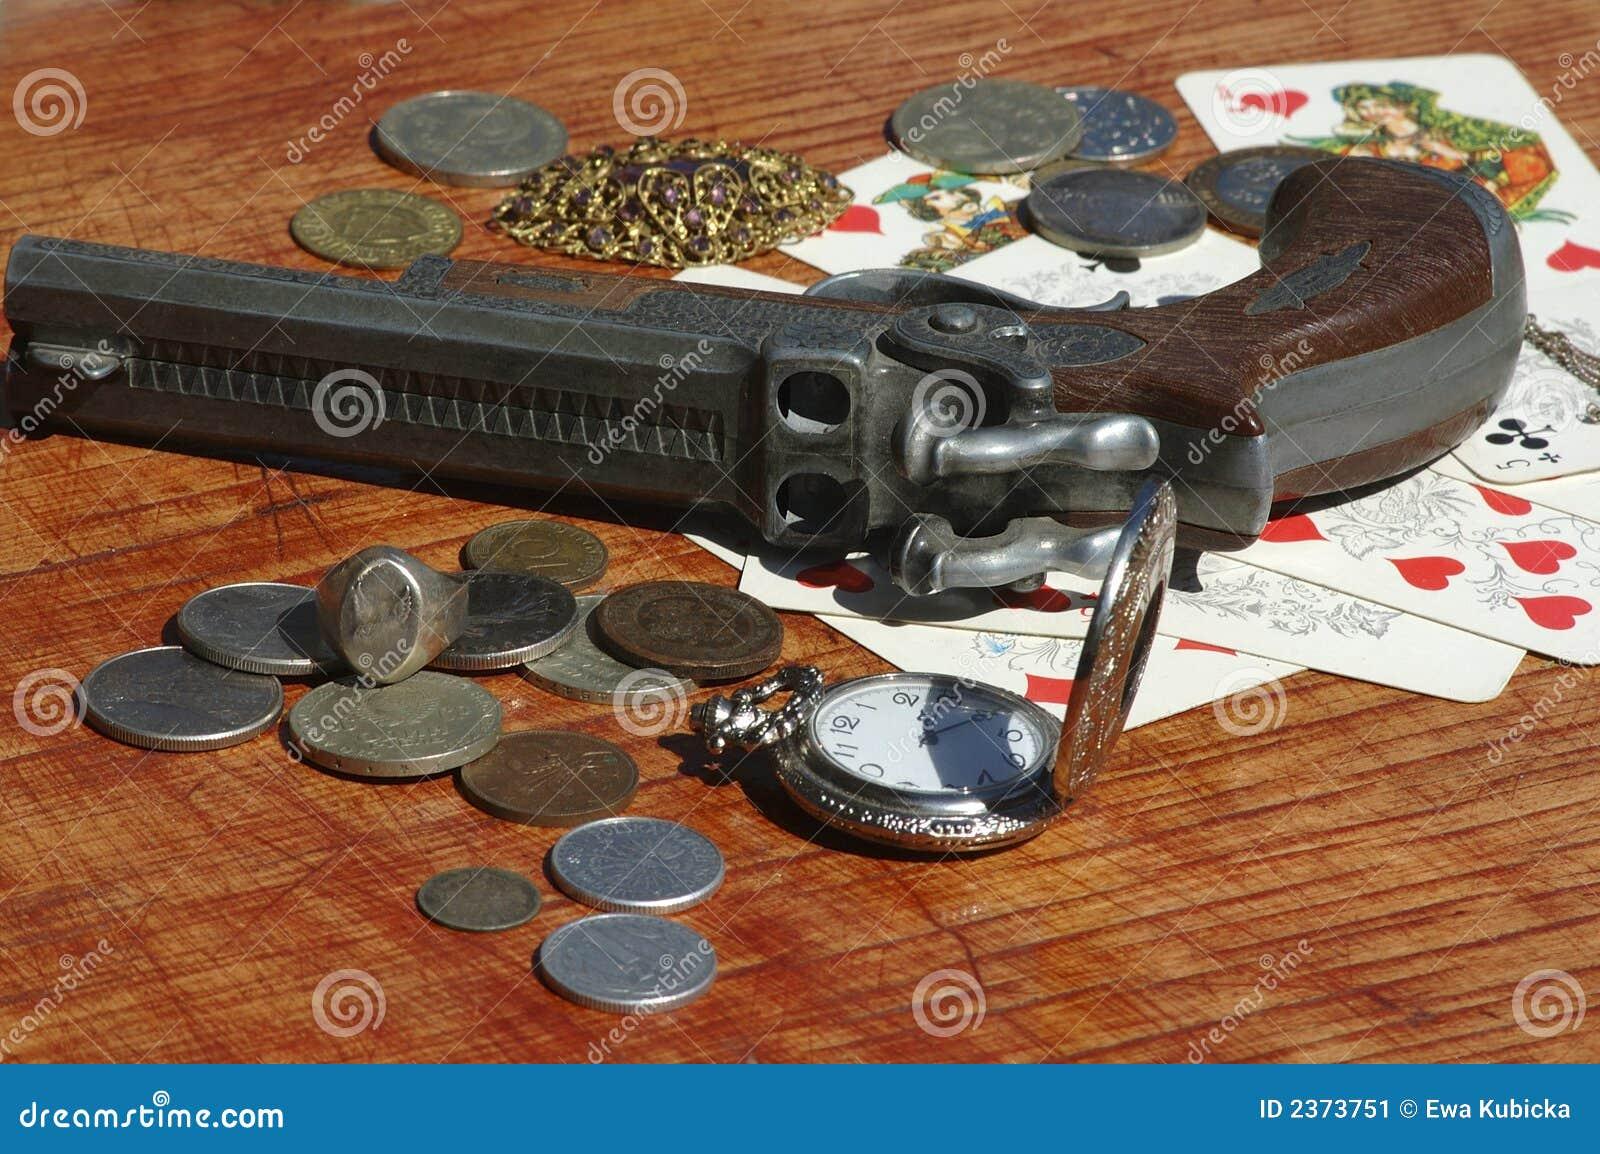 Poker table under the gun